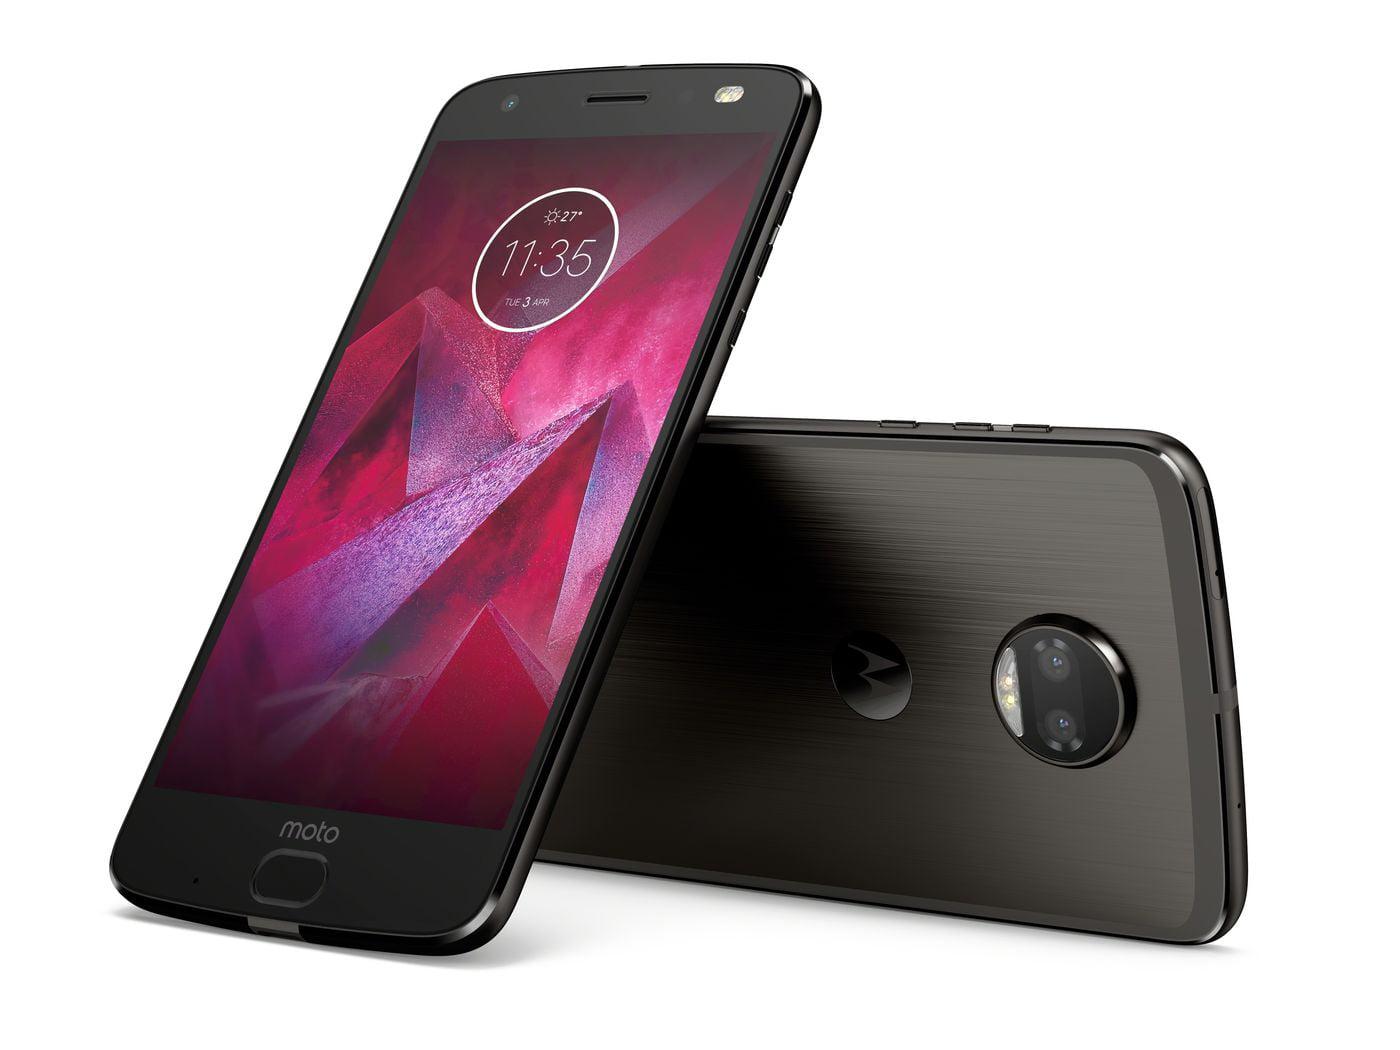 Motorola Moto Z2 Force XT1789 64GB AT&T GSM Global Unlocked Smartphone Fine Gold ( Refurbished ) by